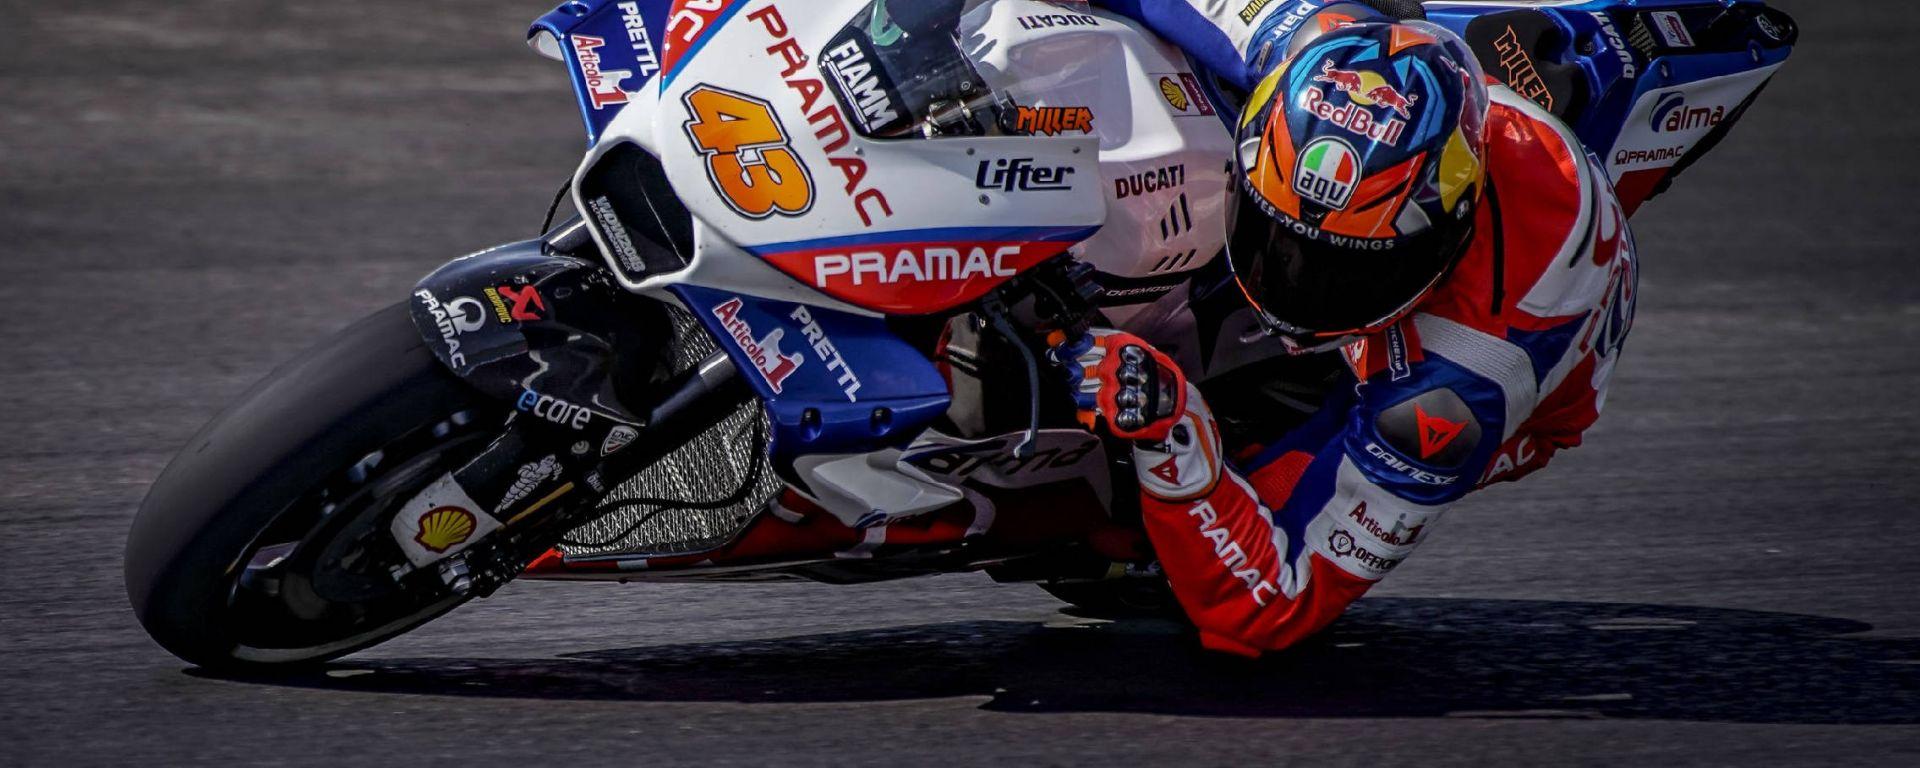 MotoGP Argentina 2018: Jack Miller in pole davanti a Pedrosa e Zarcò